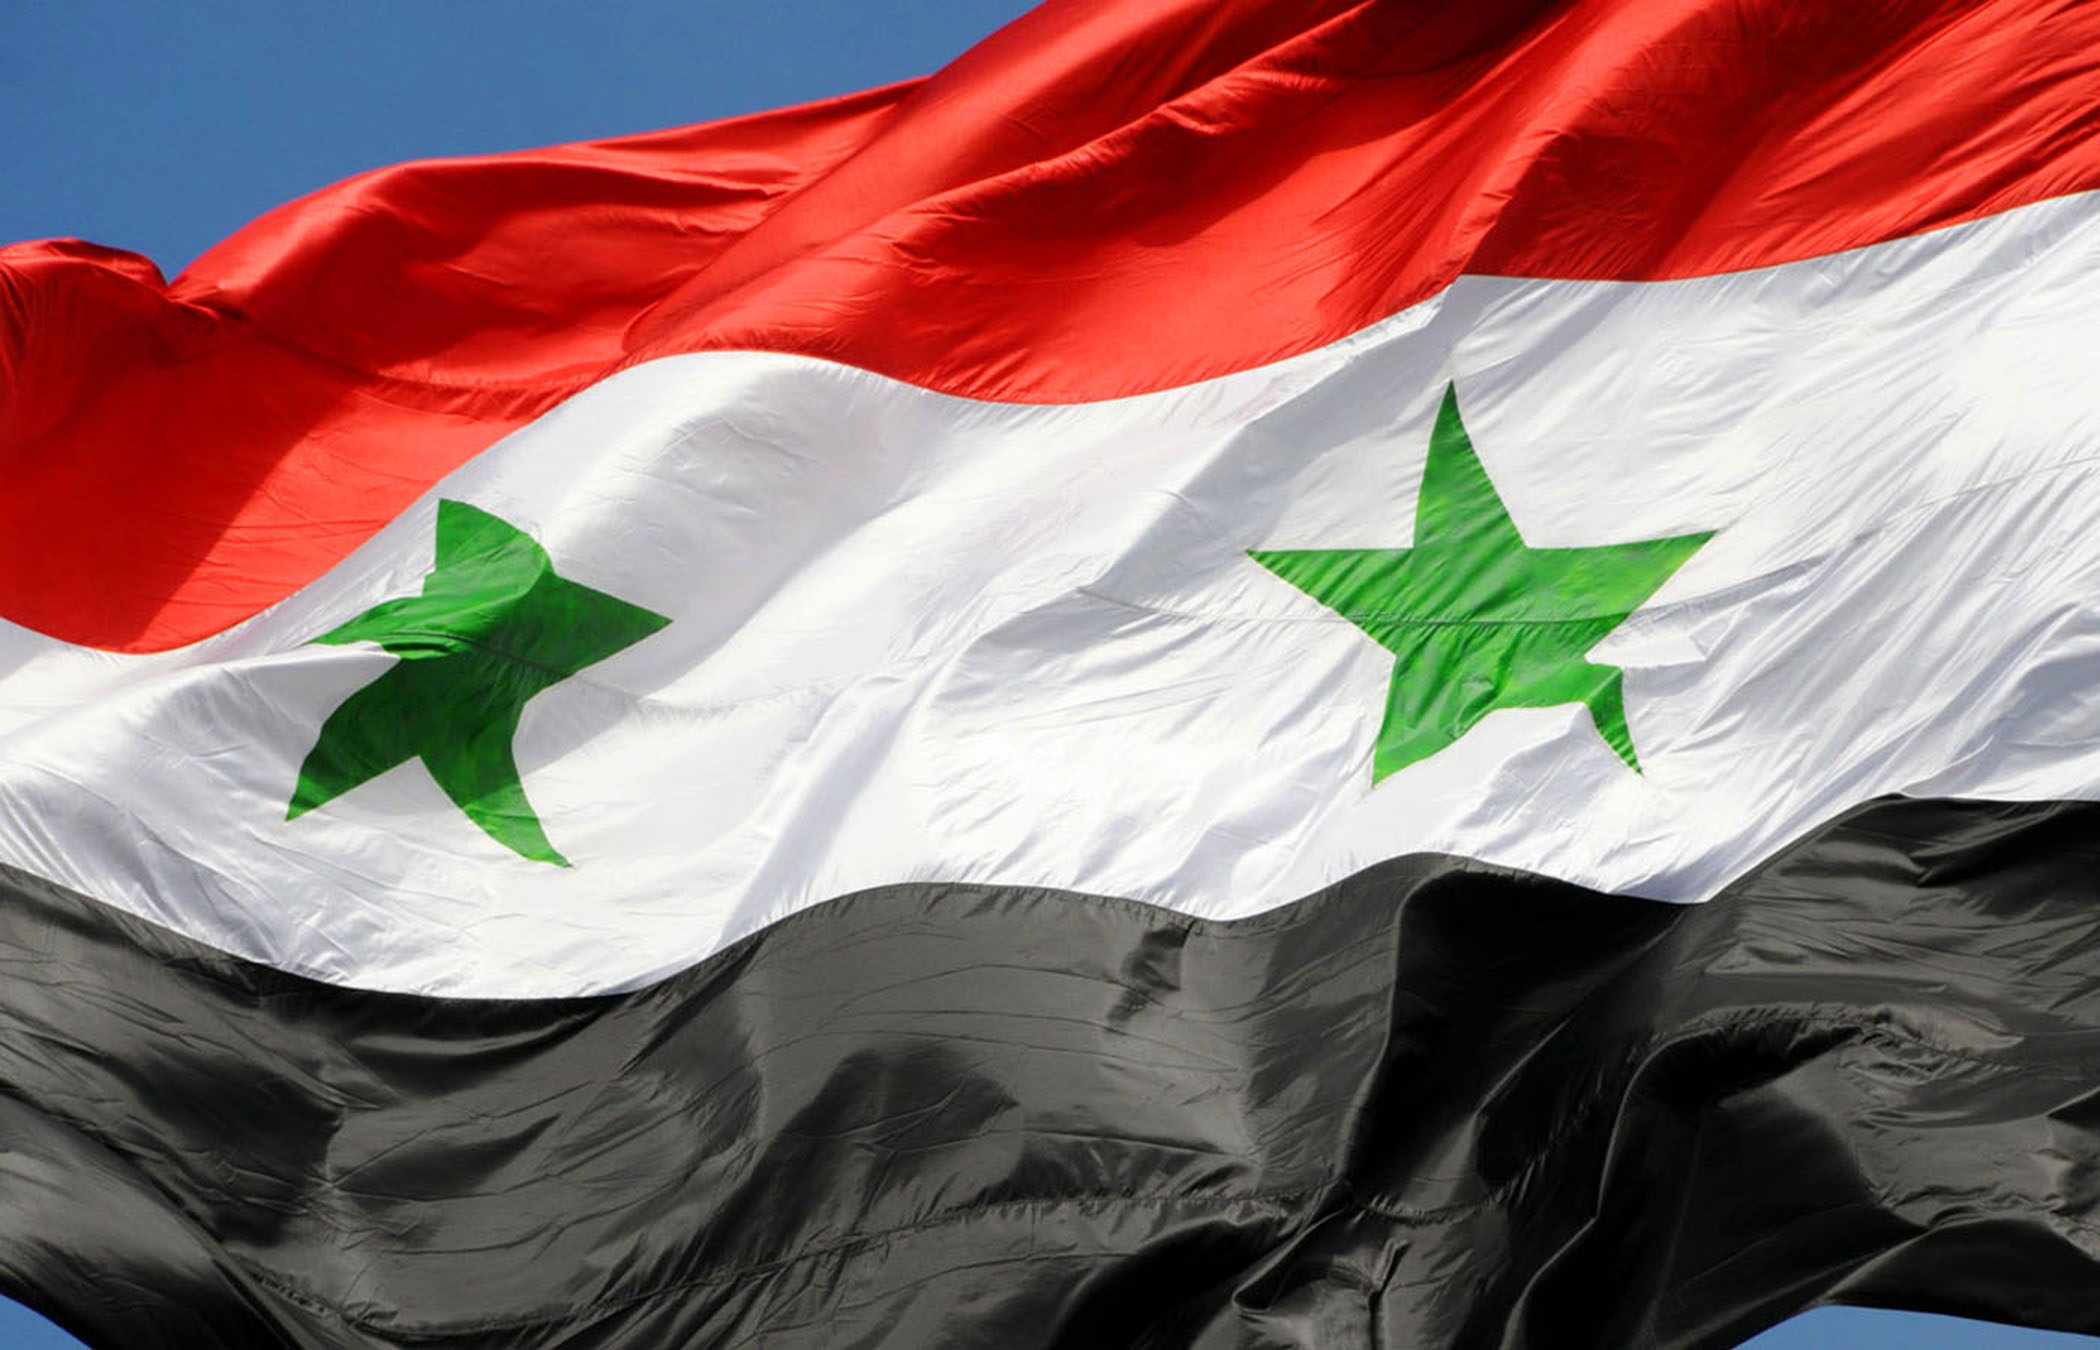 Photo of دمشق: سنشارك في جنيف.. وإيران طرف إيجابي في تحولات المنطقة